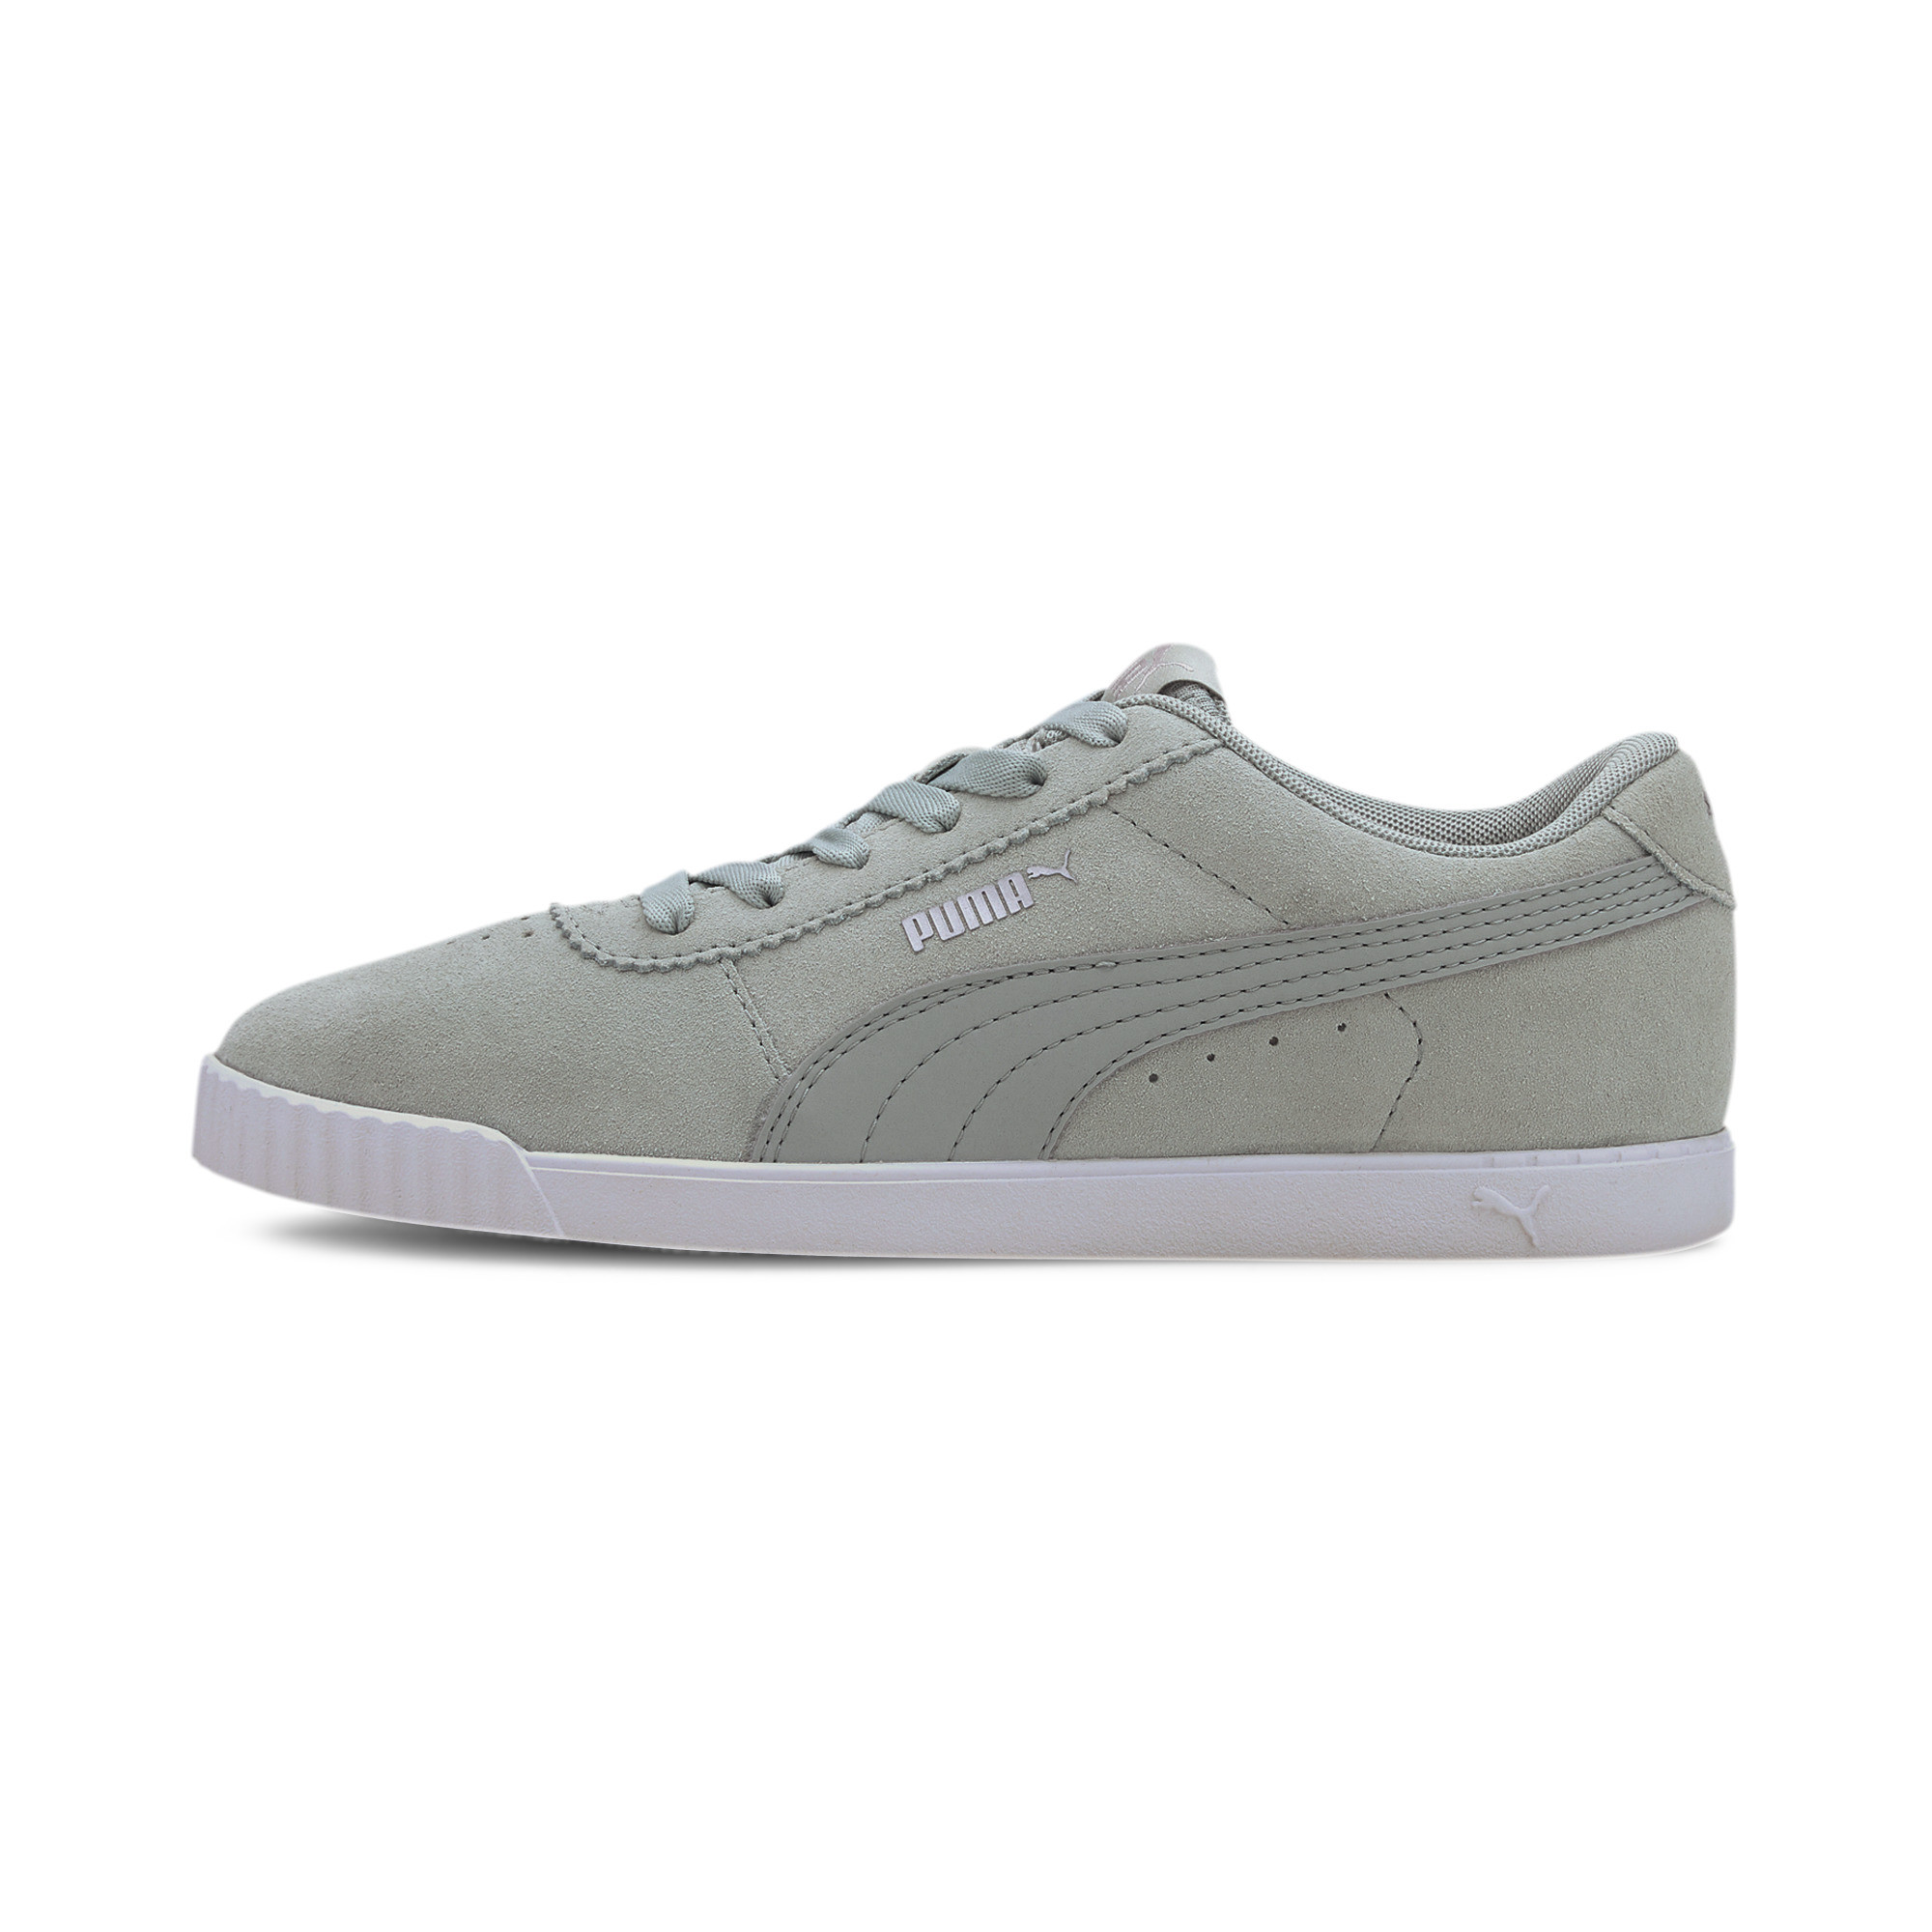 PUMA-Women-039-s-Carina-Slim-Suede-Sneakers thumbnail 25